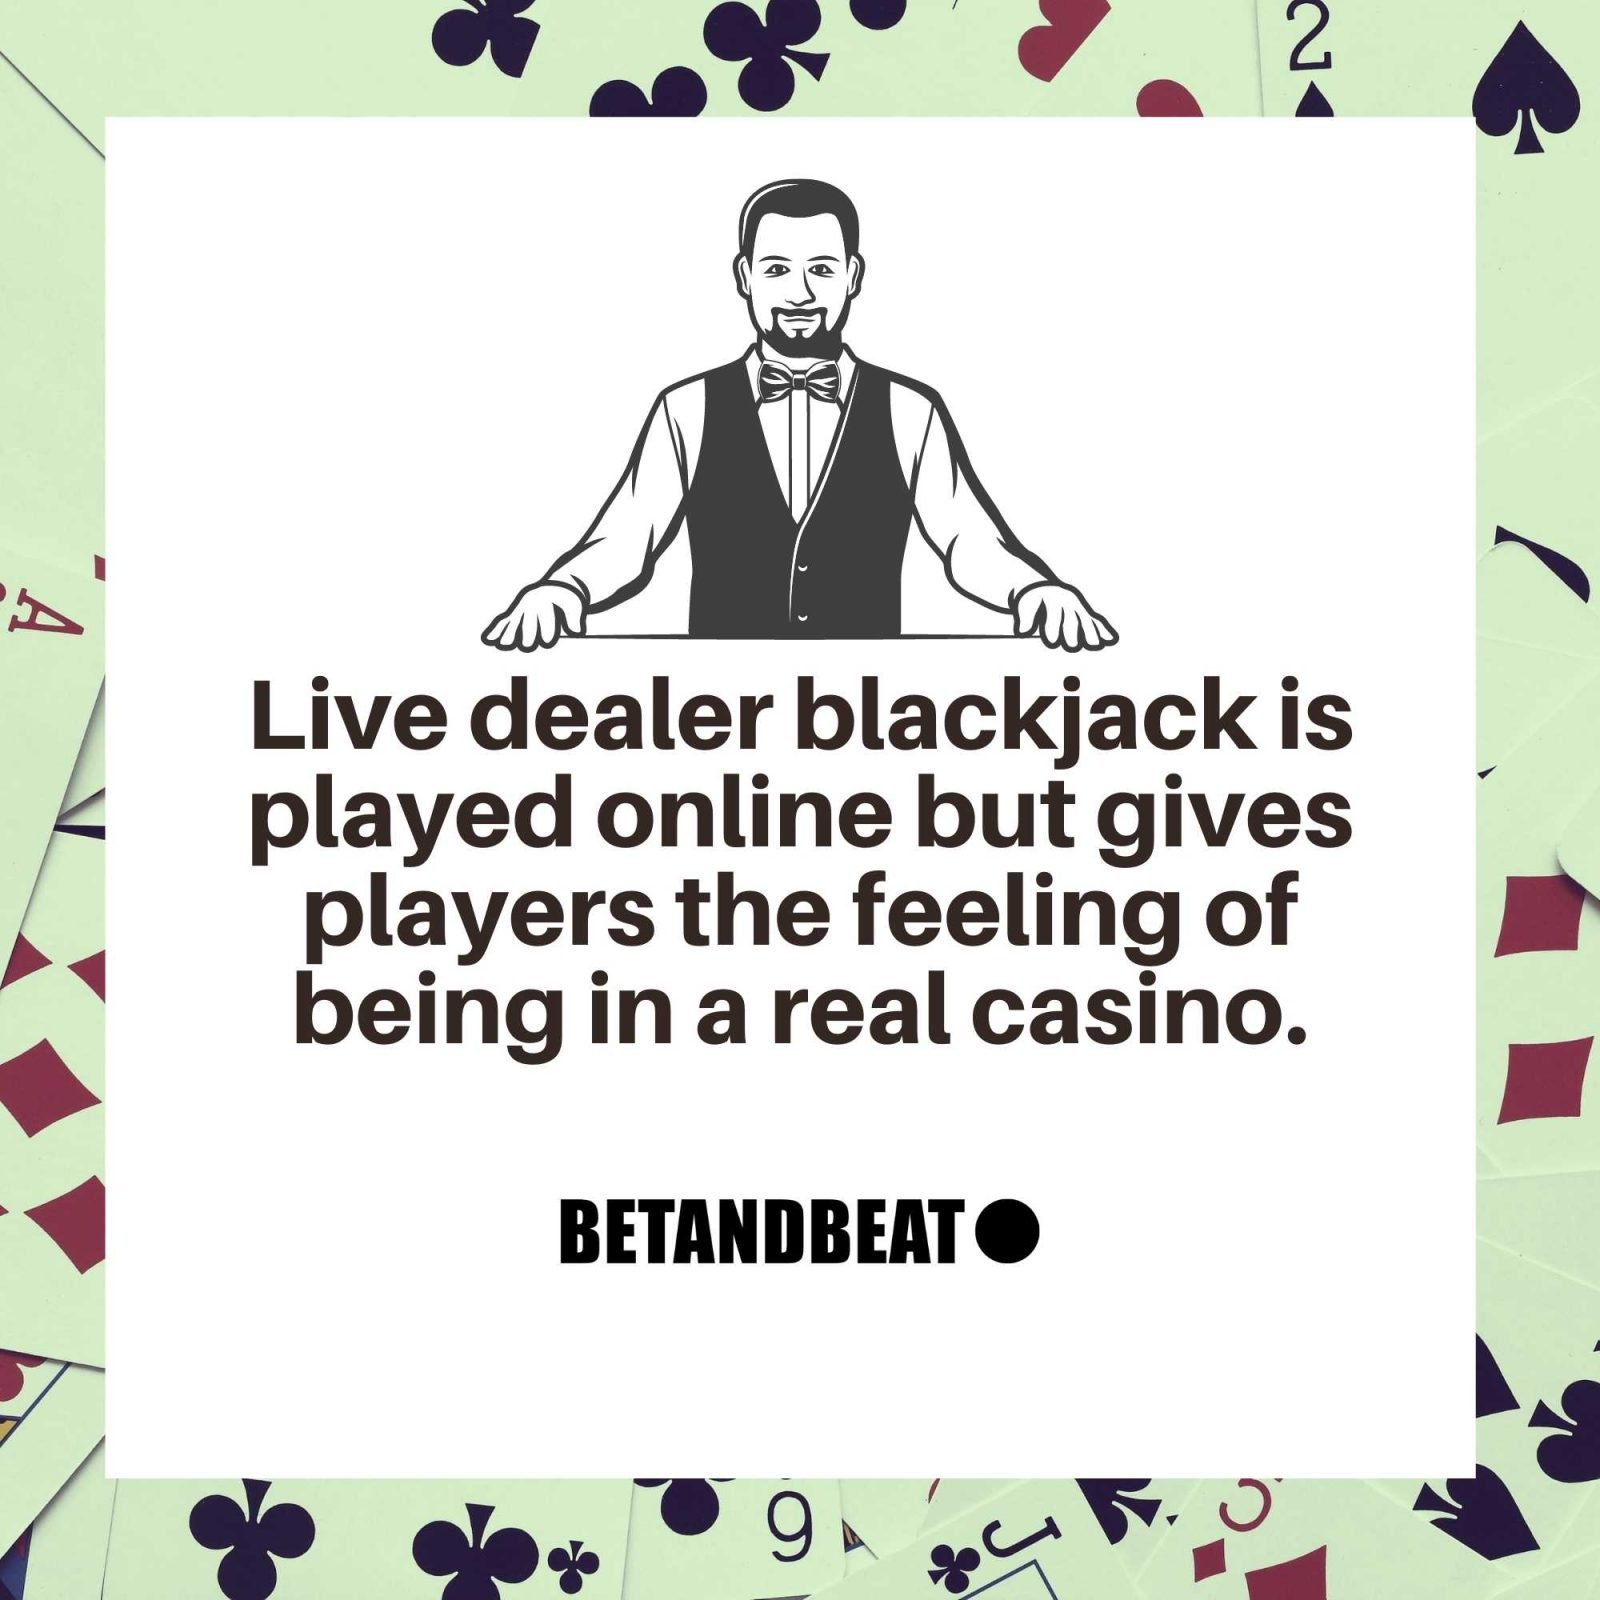 The feeling you get when you play live dealer blackjack.